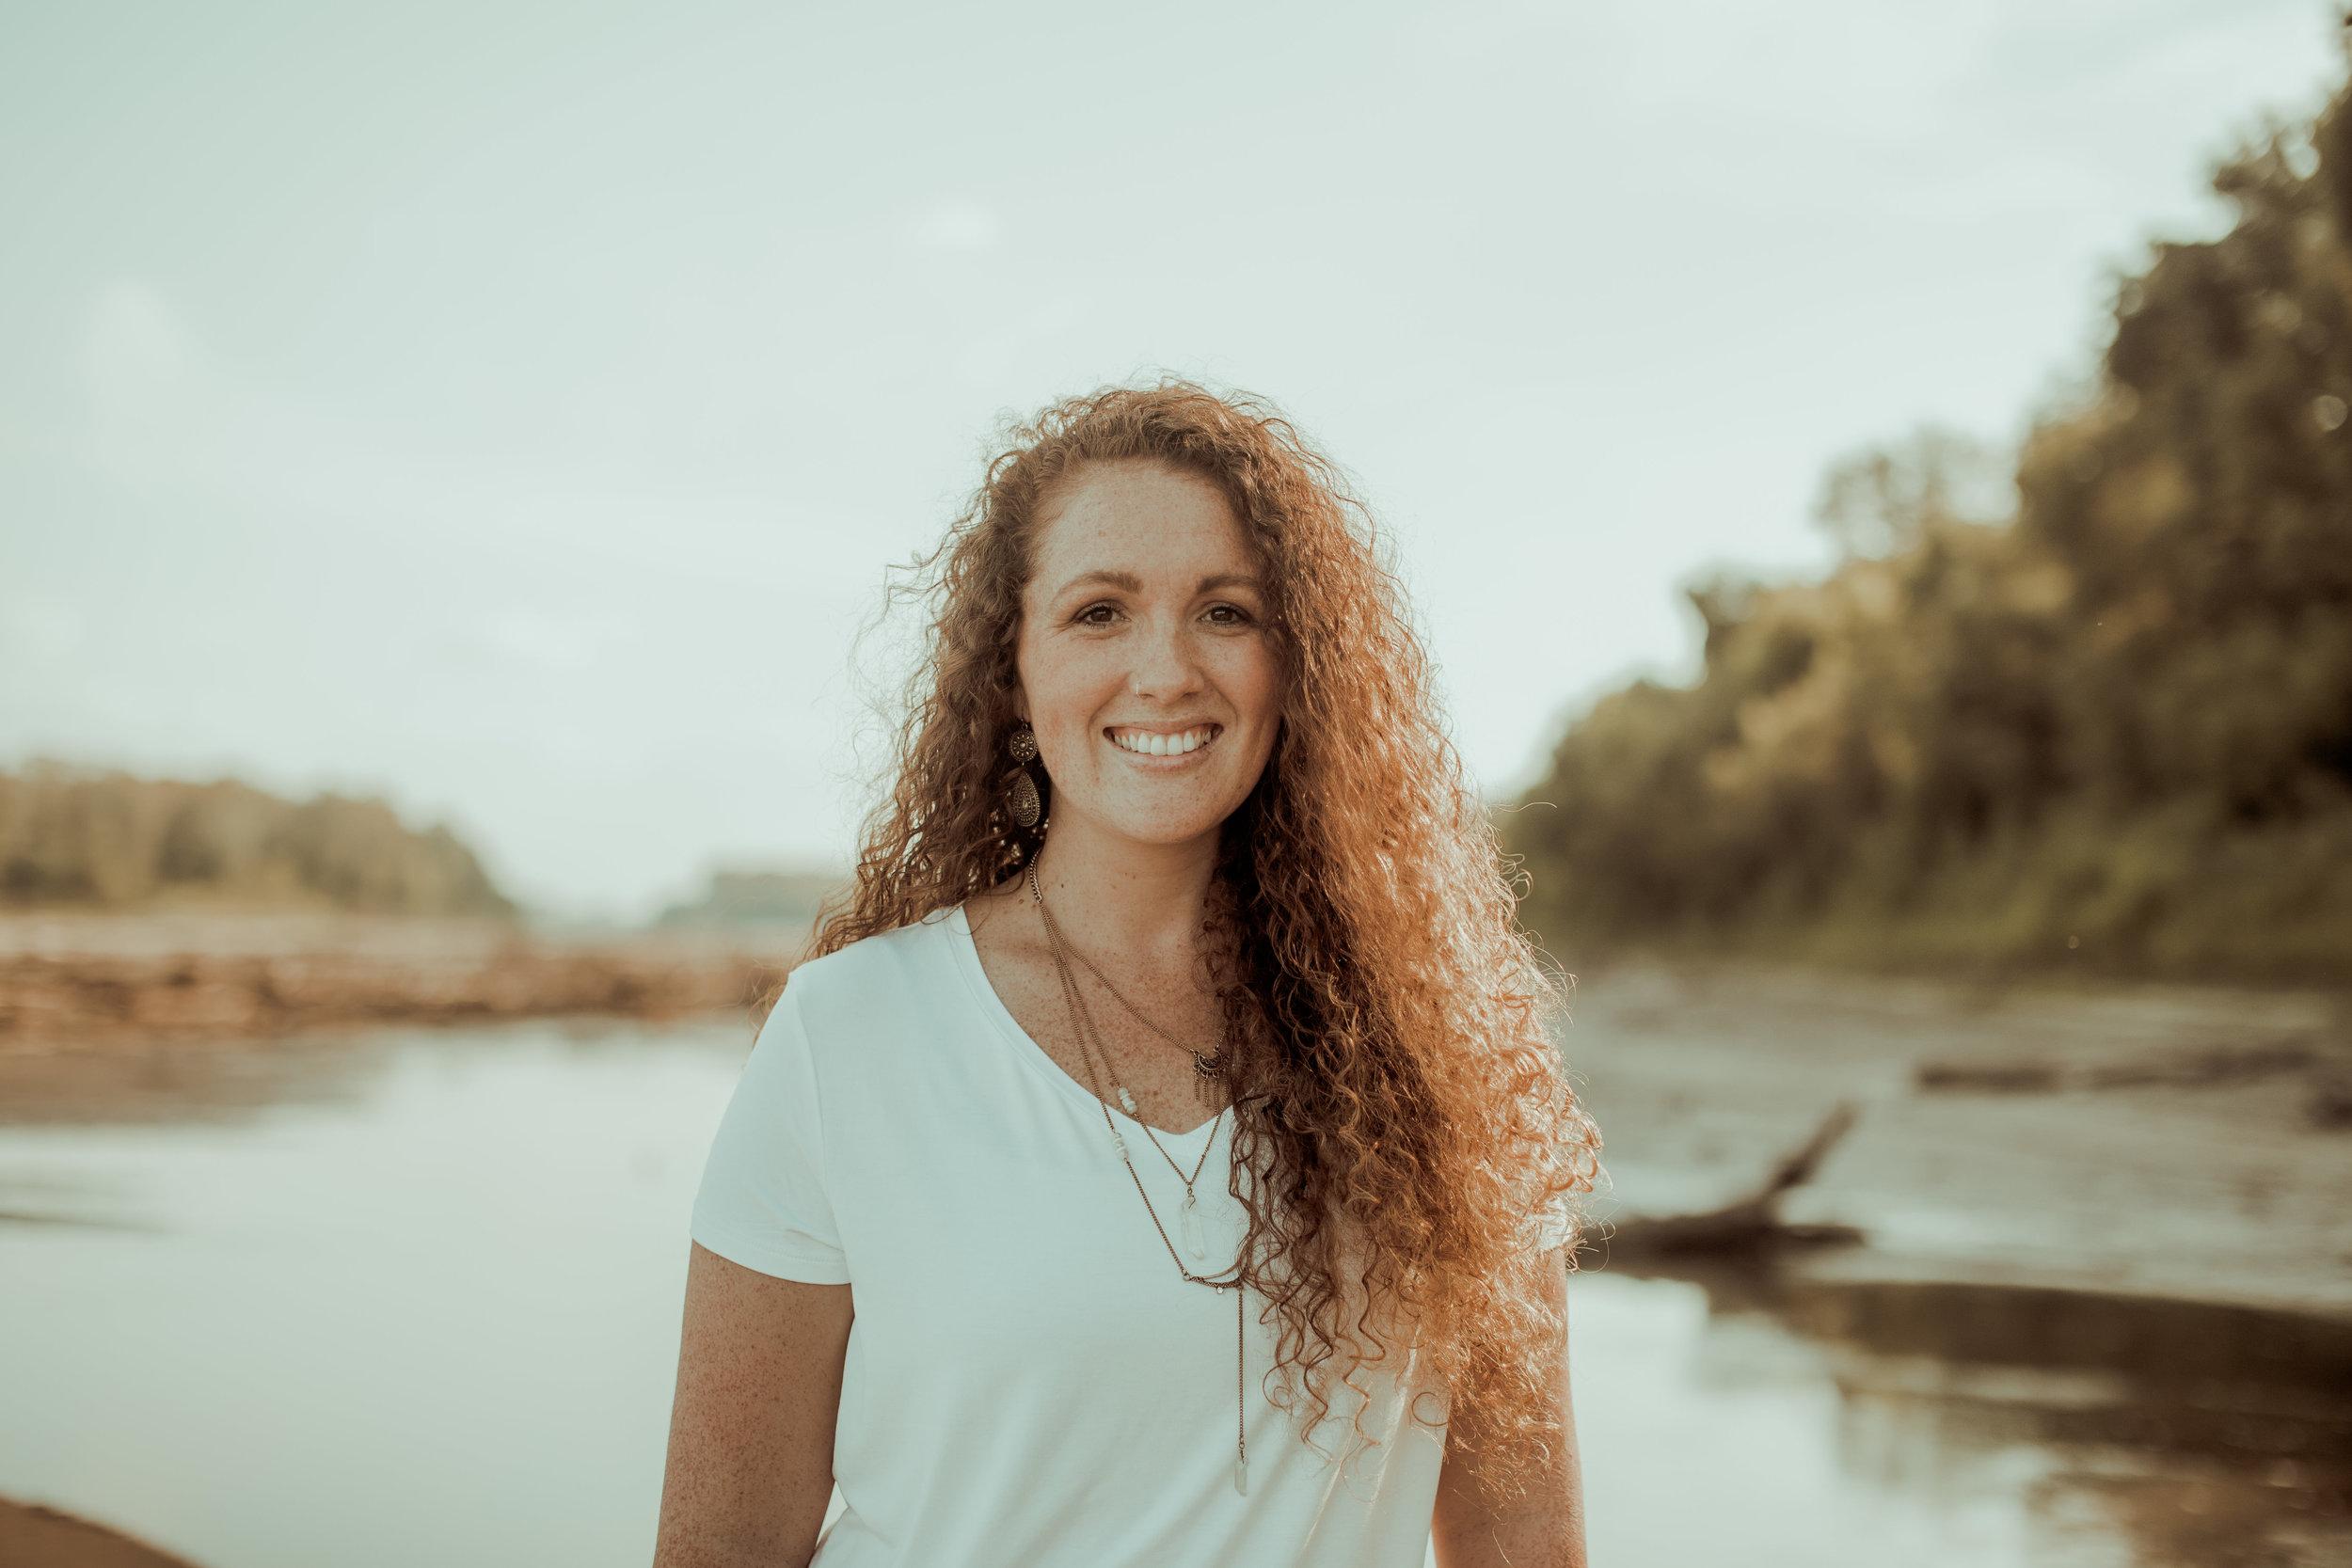 Branding and Business Coach for female online entrepreneurs